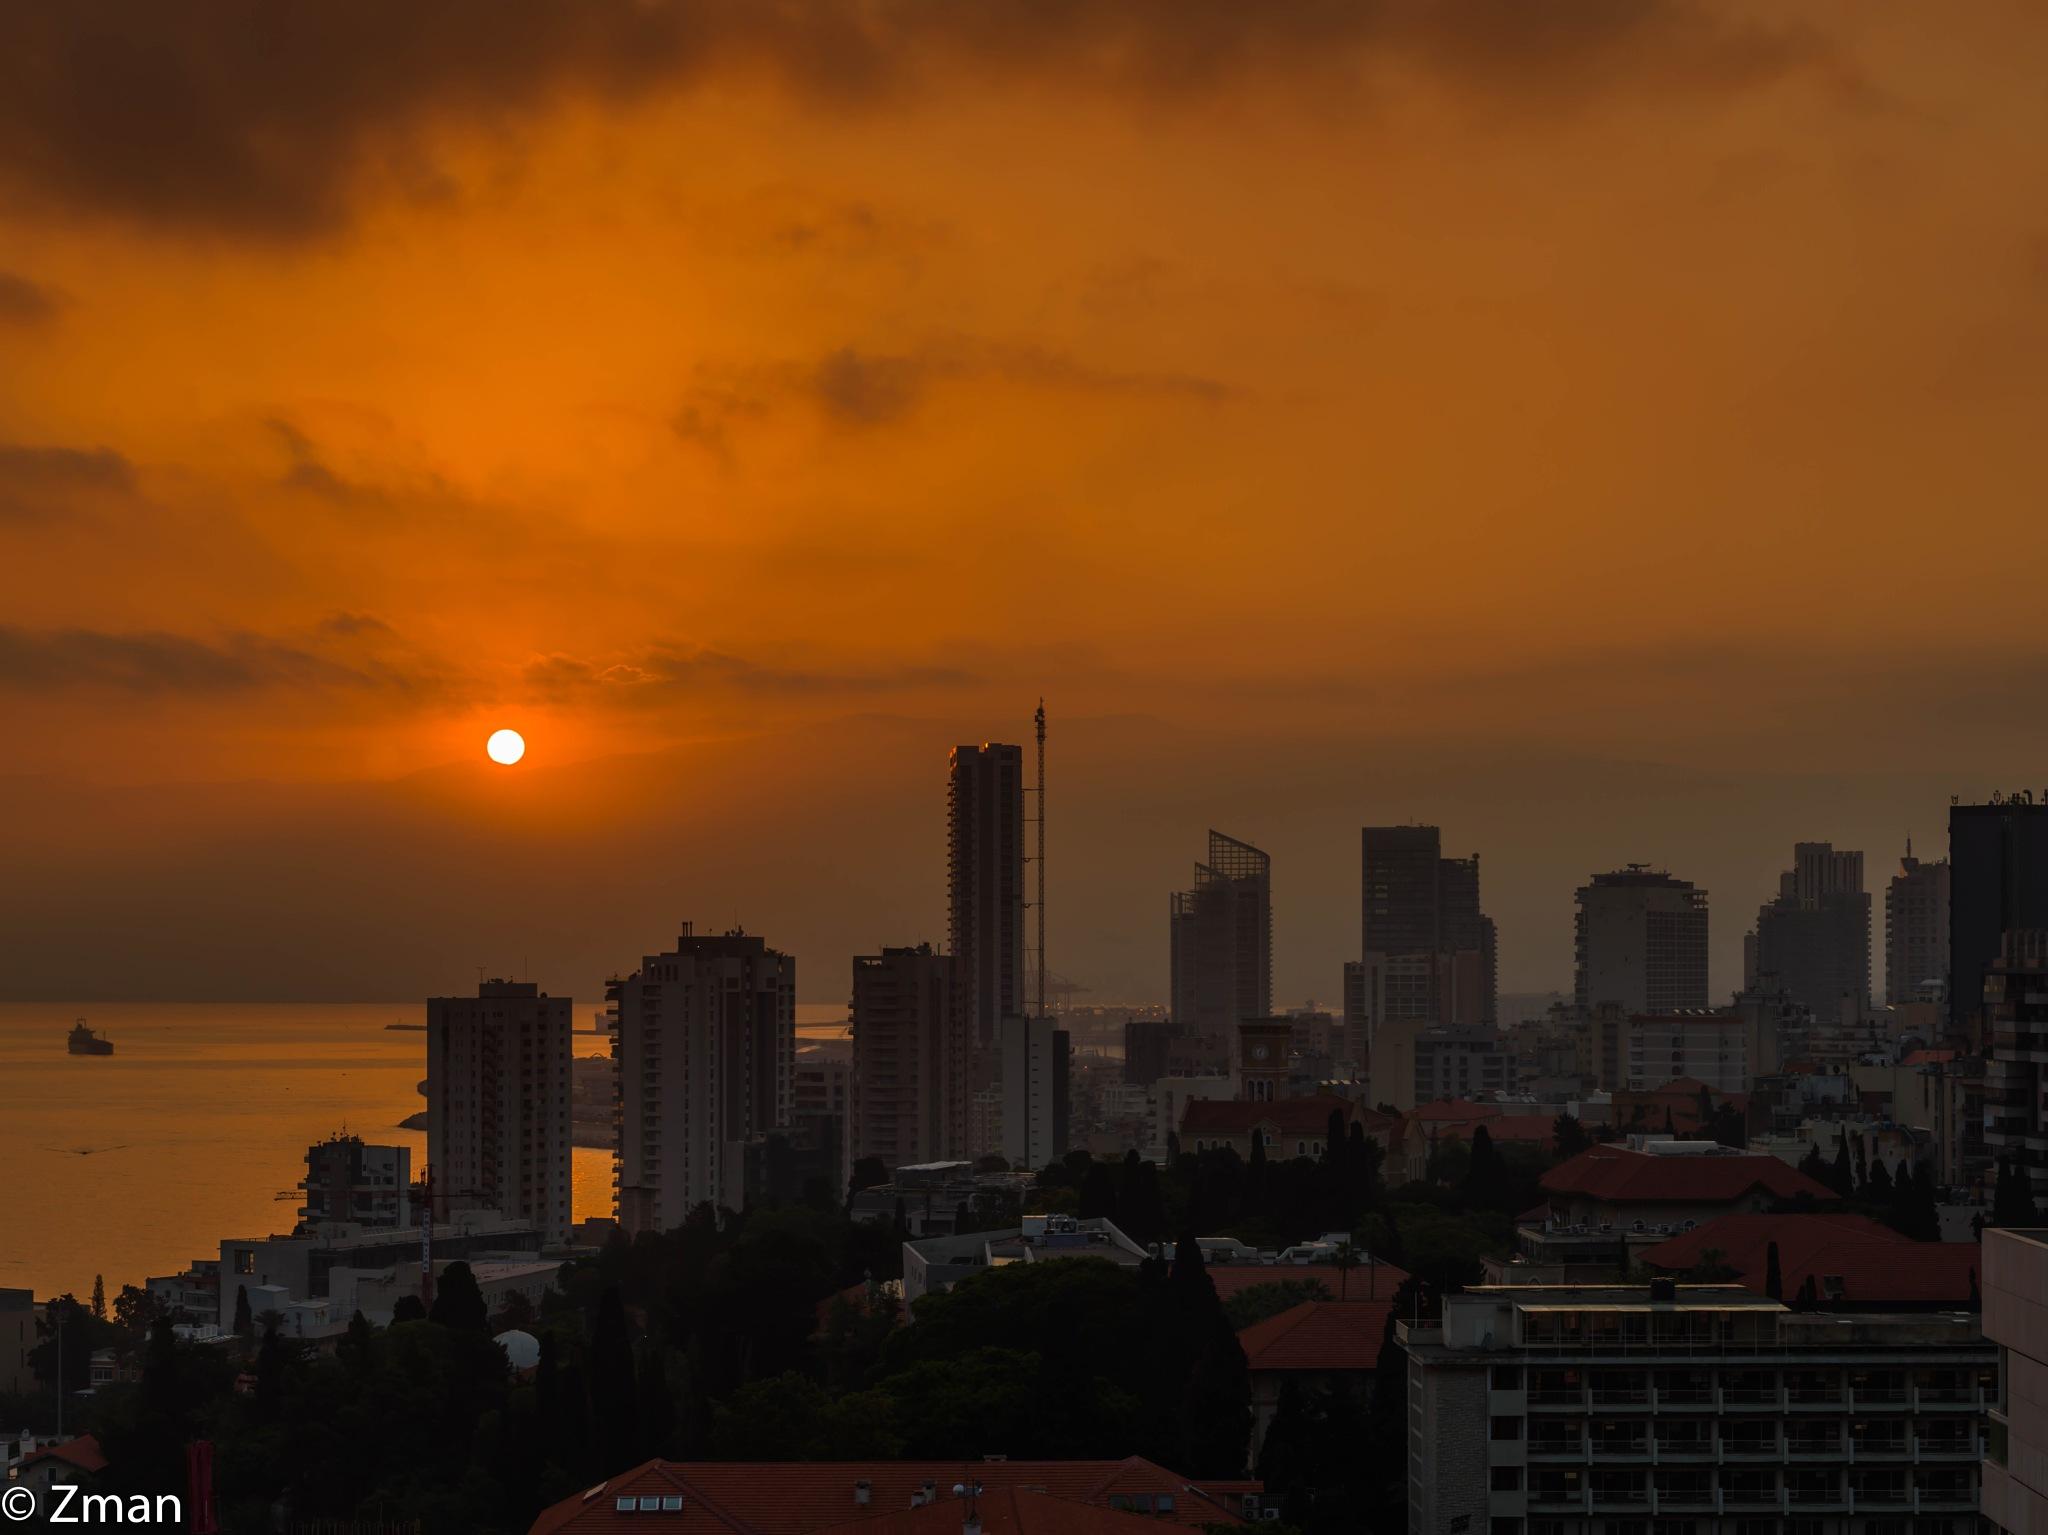 My City at Sunrise by muhammad.nasser.963